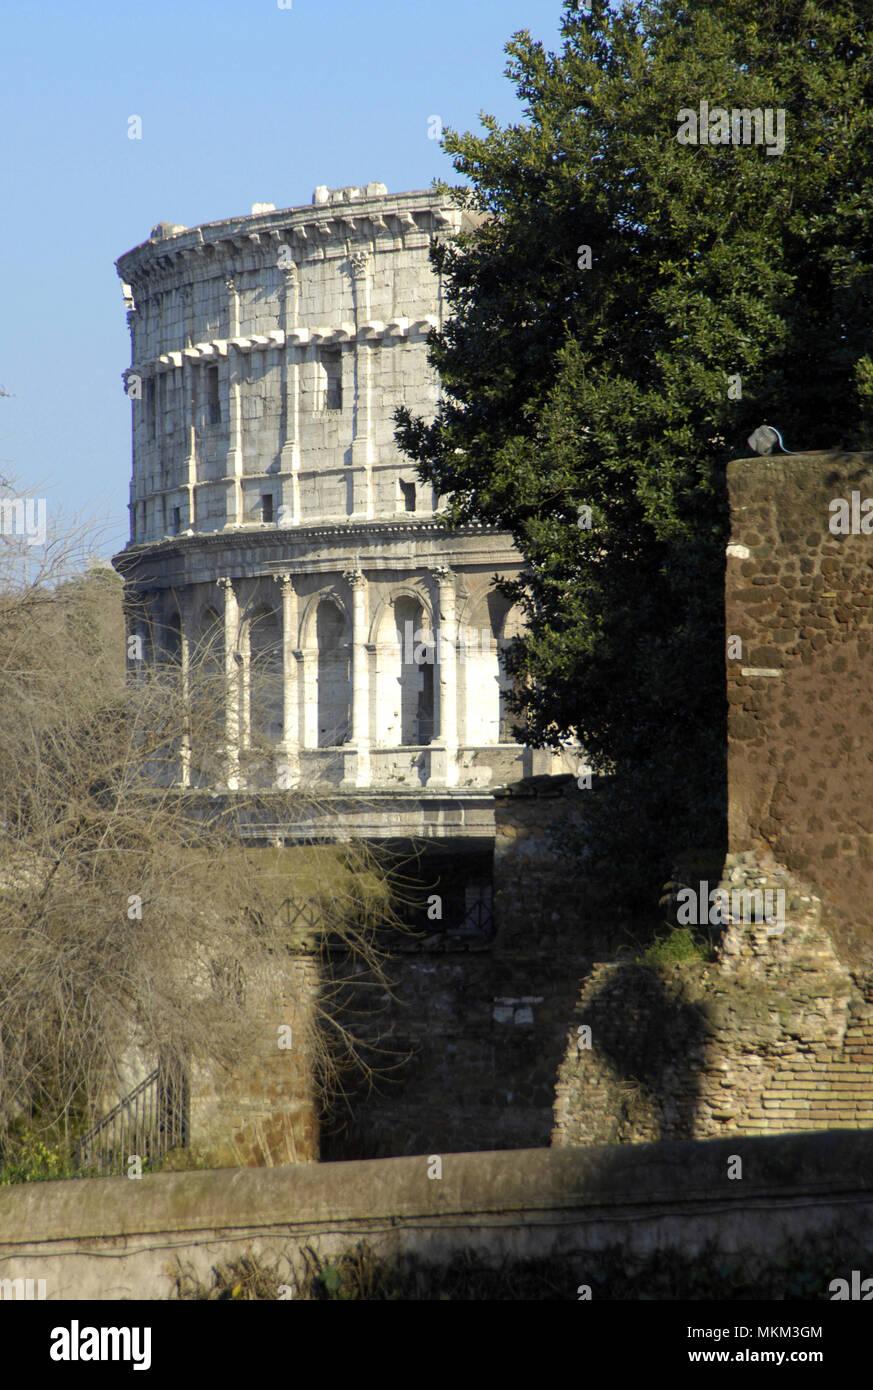 Rom; Sozialismus; Roma antica; Rom; Colosseo; Kolosseum; Colosseum; Italienisch; Italien; Italia; Latium; Lazium; Europa; Europa; Reise; Reisen; viaggio; Christe Stockbild